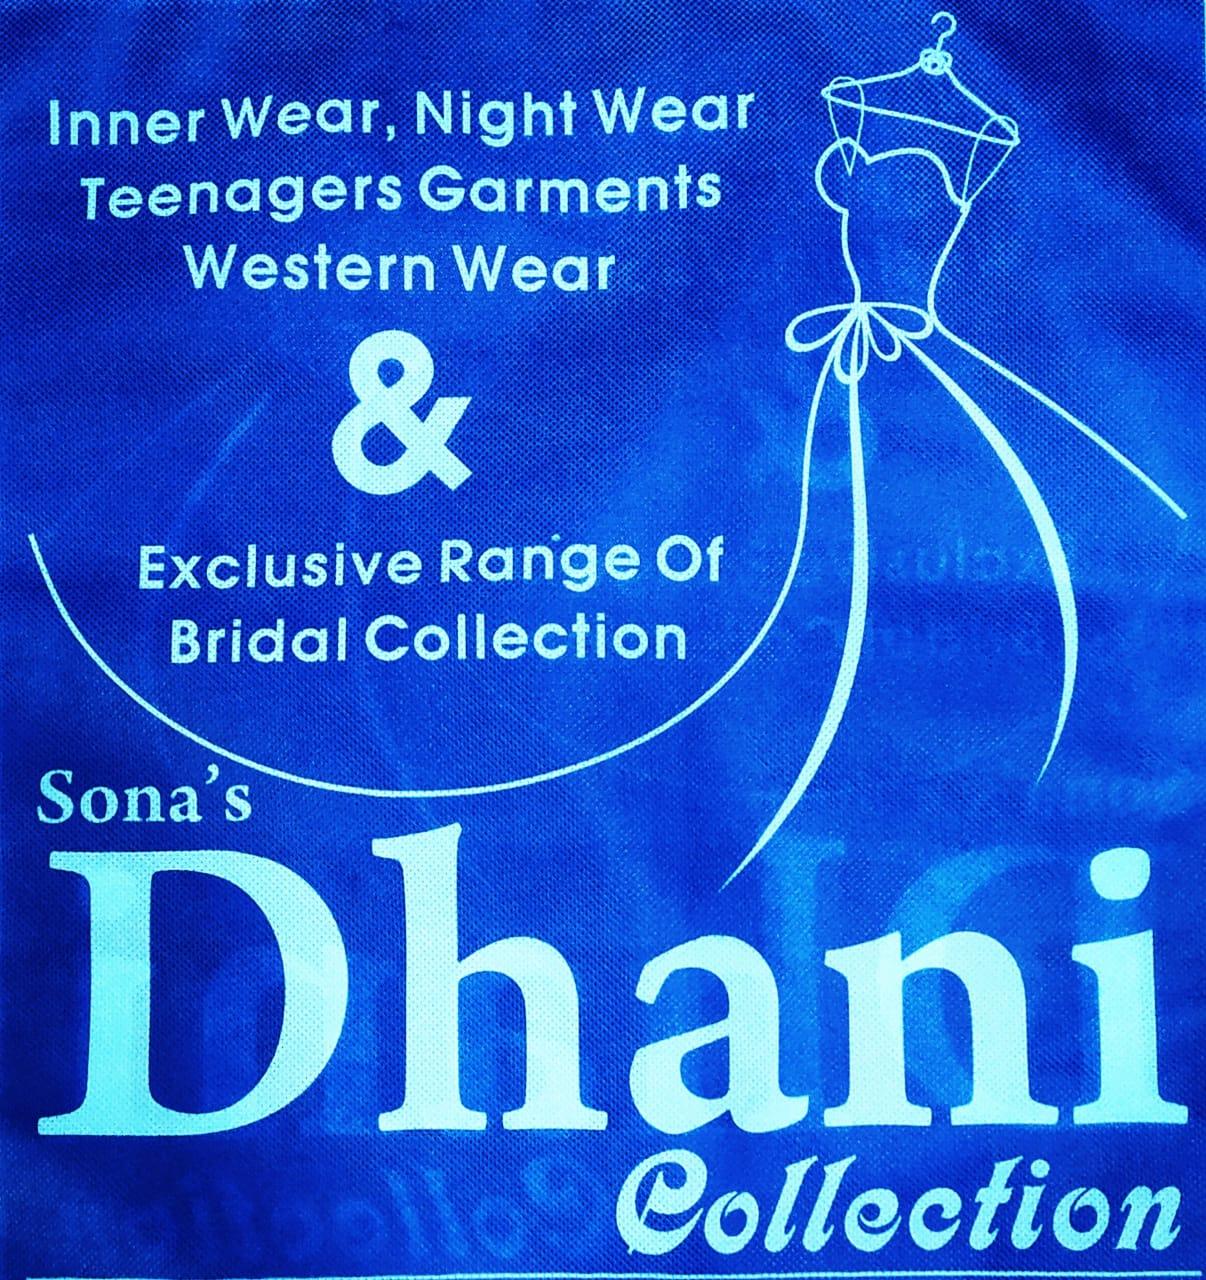 DHANI COLLECTION